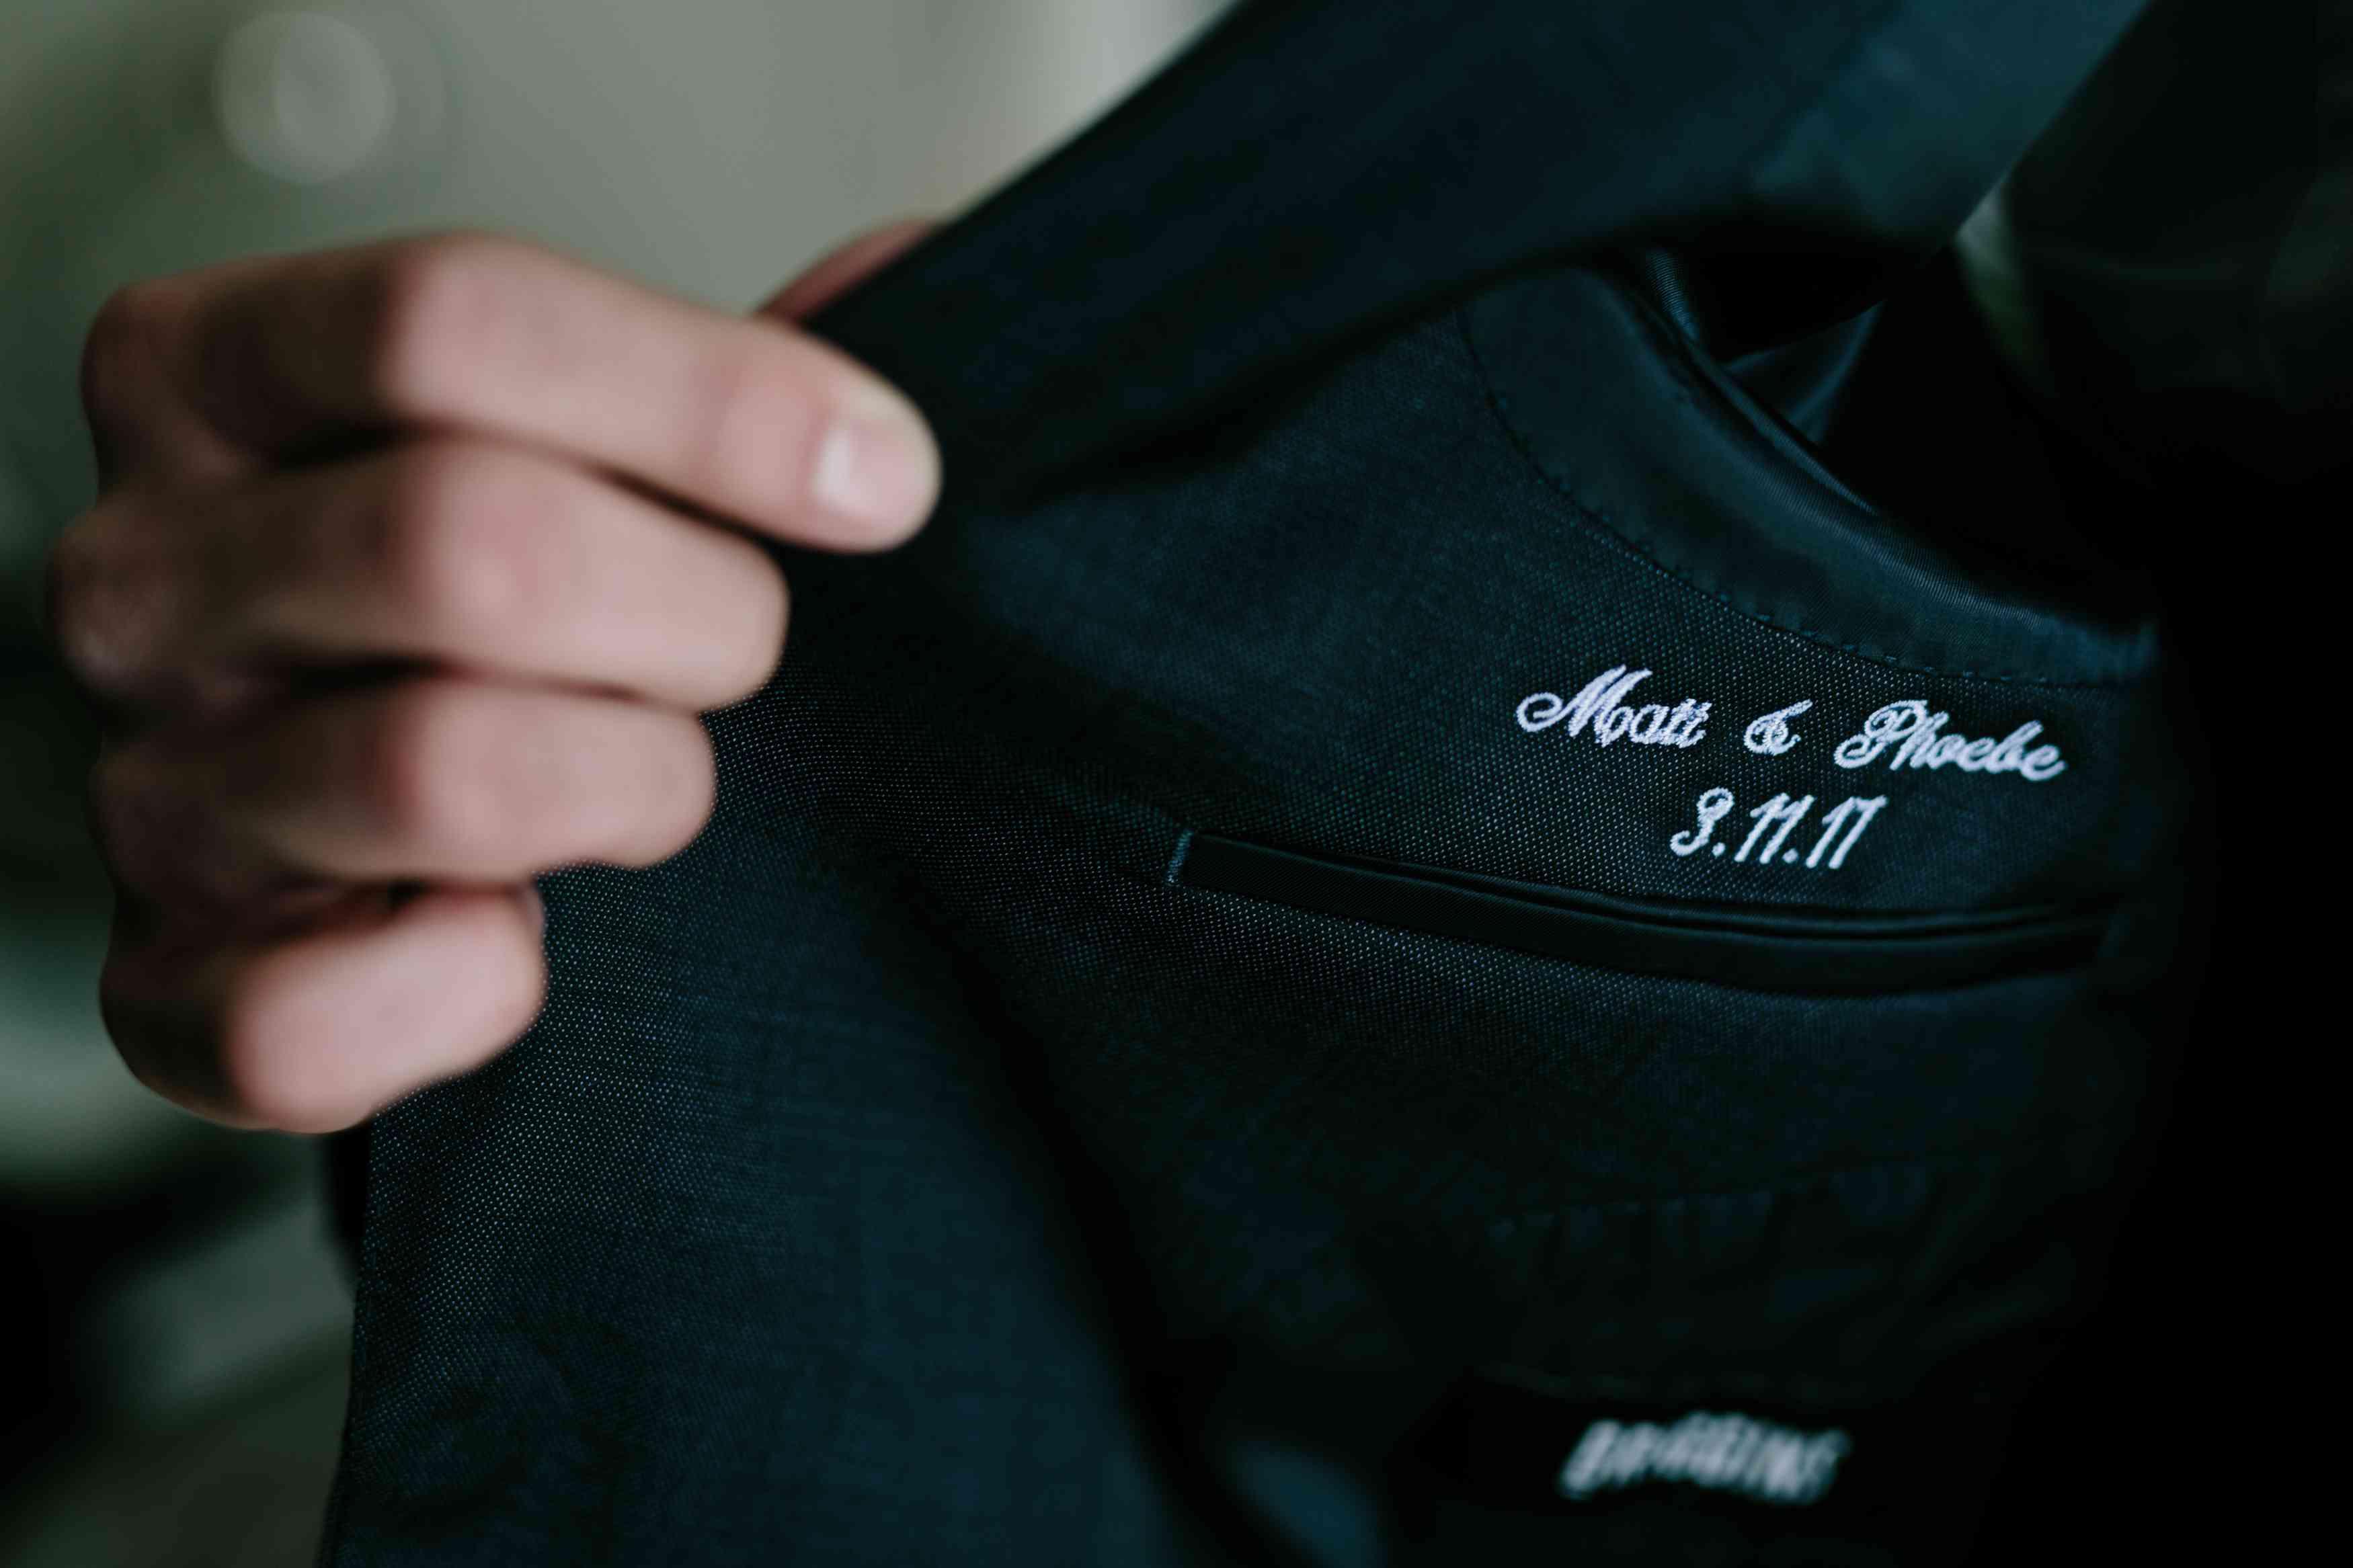 <p>personalized suit</p><br><br>